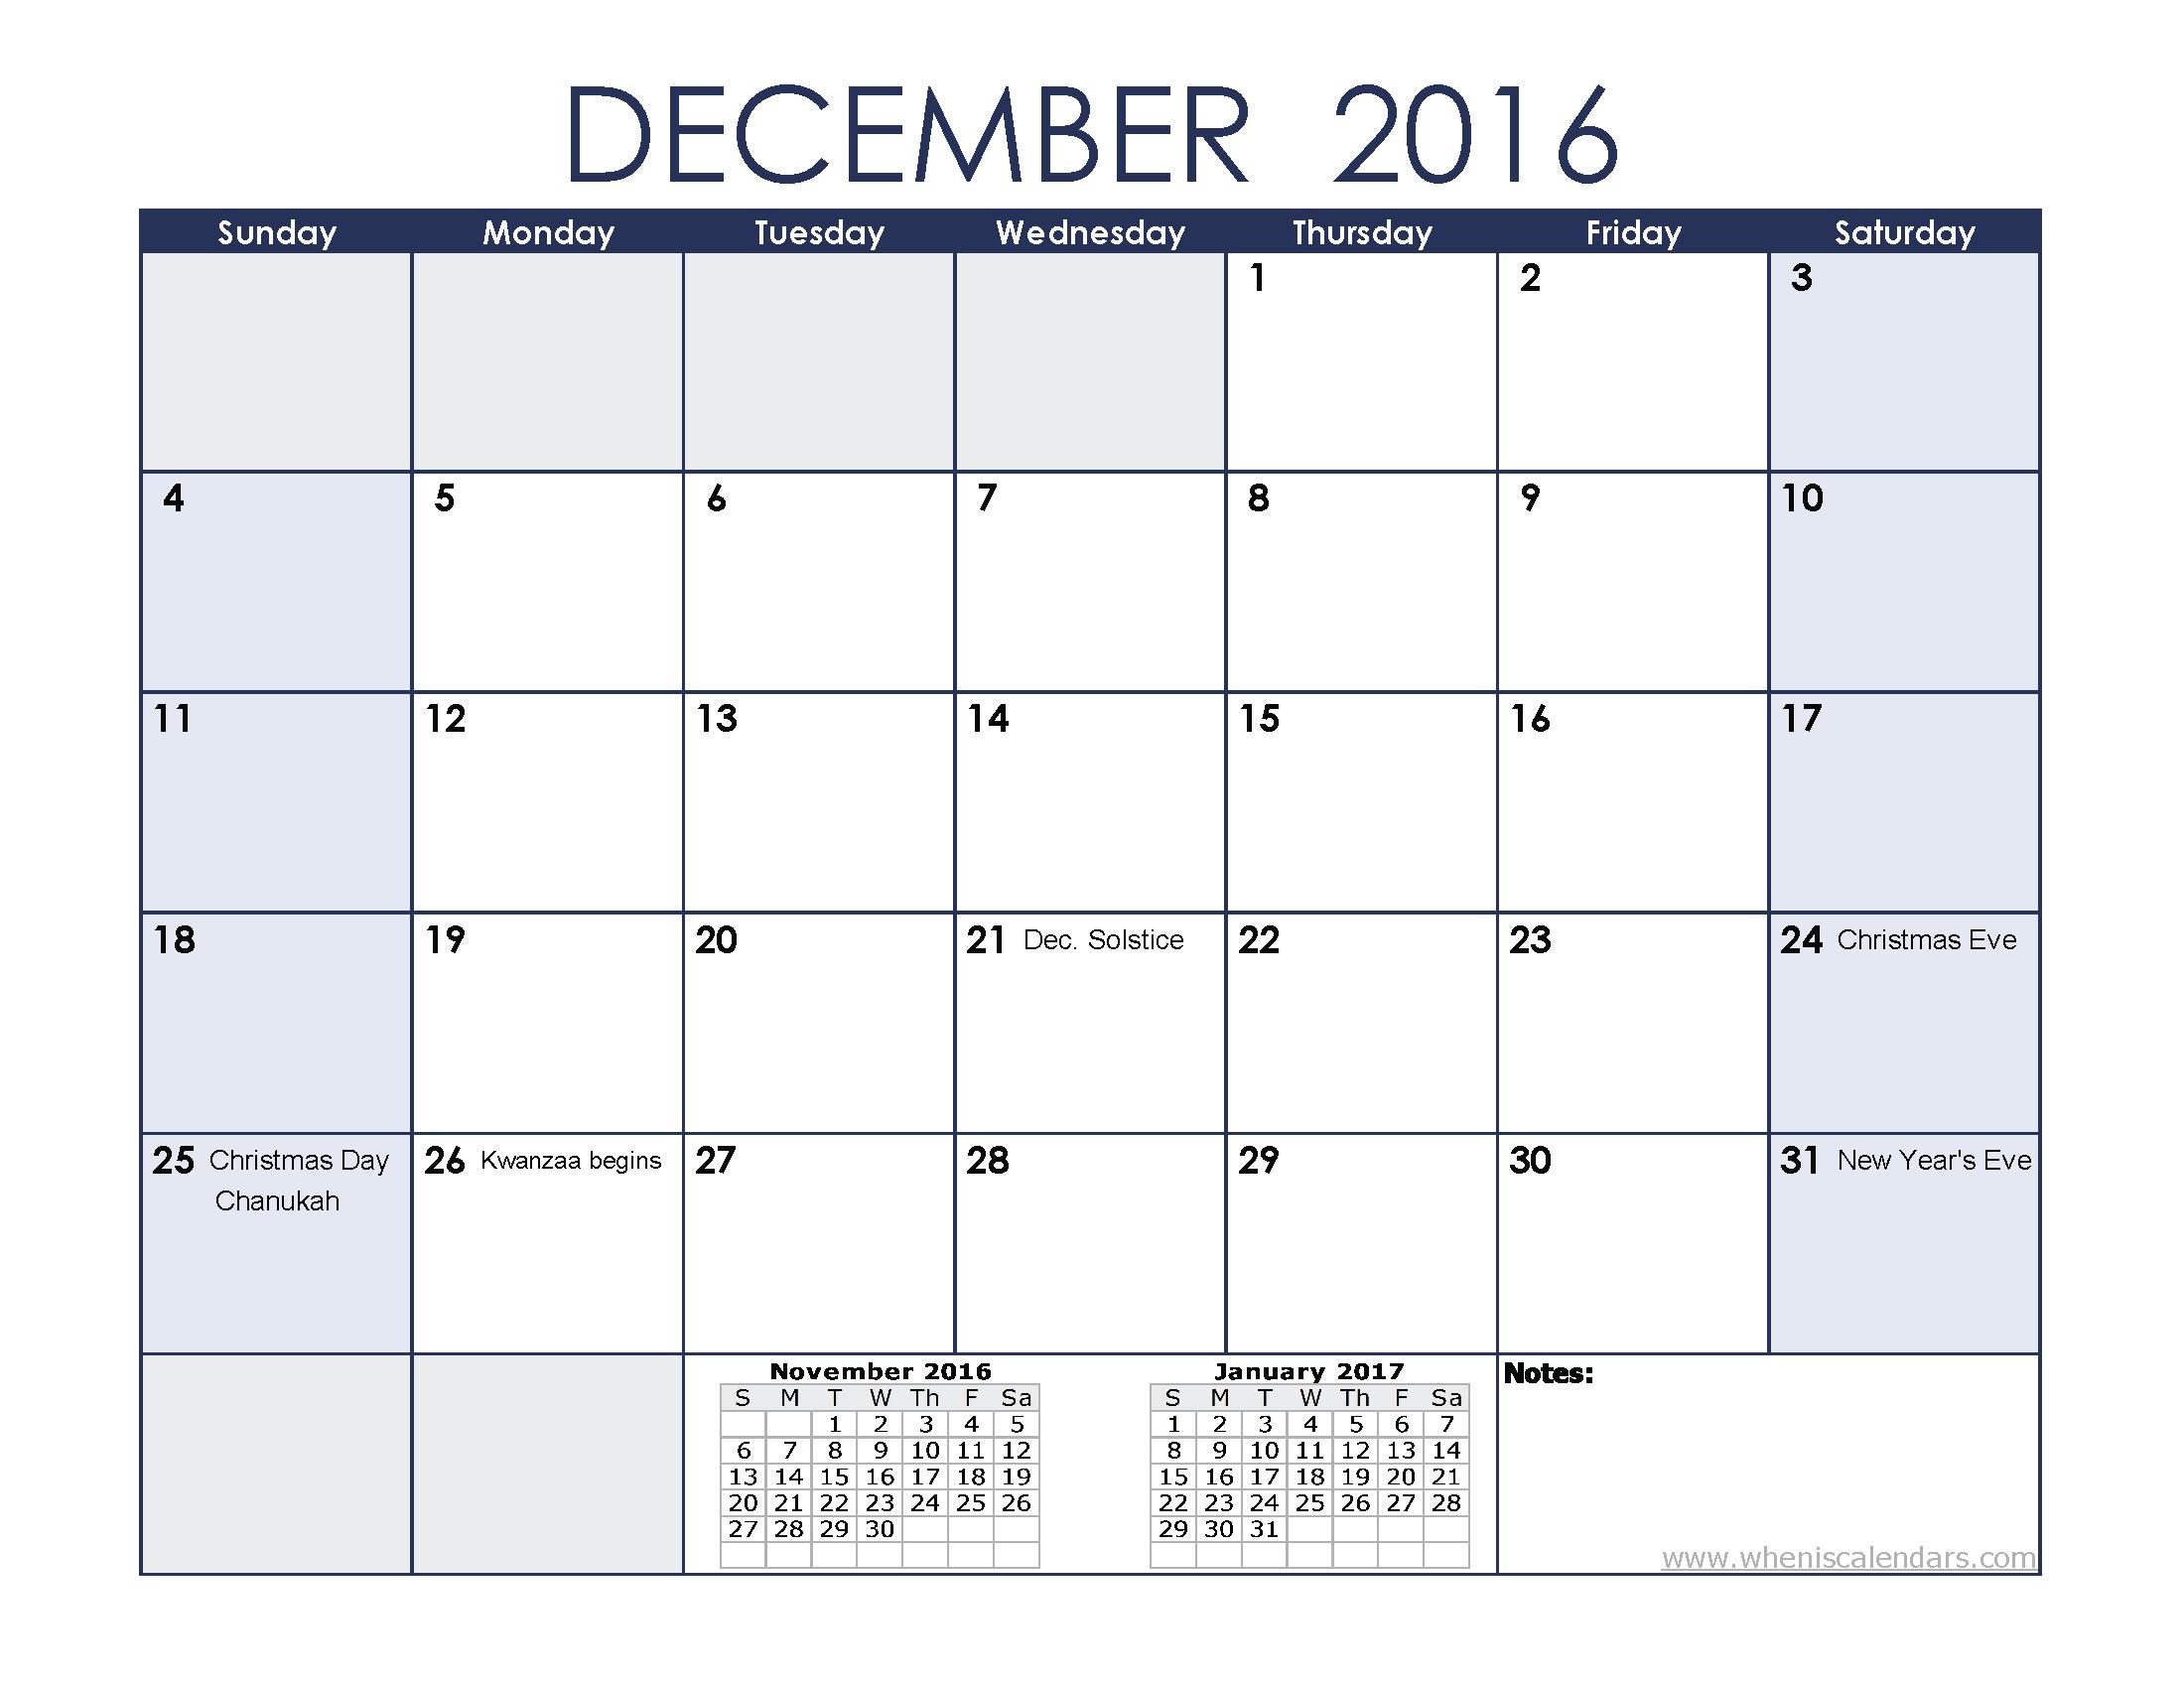 December 2016 Holidays Calendar